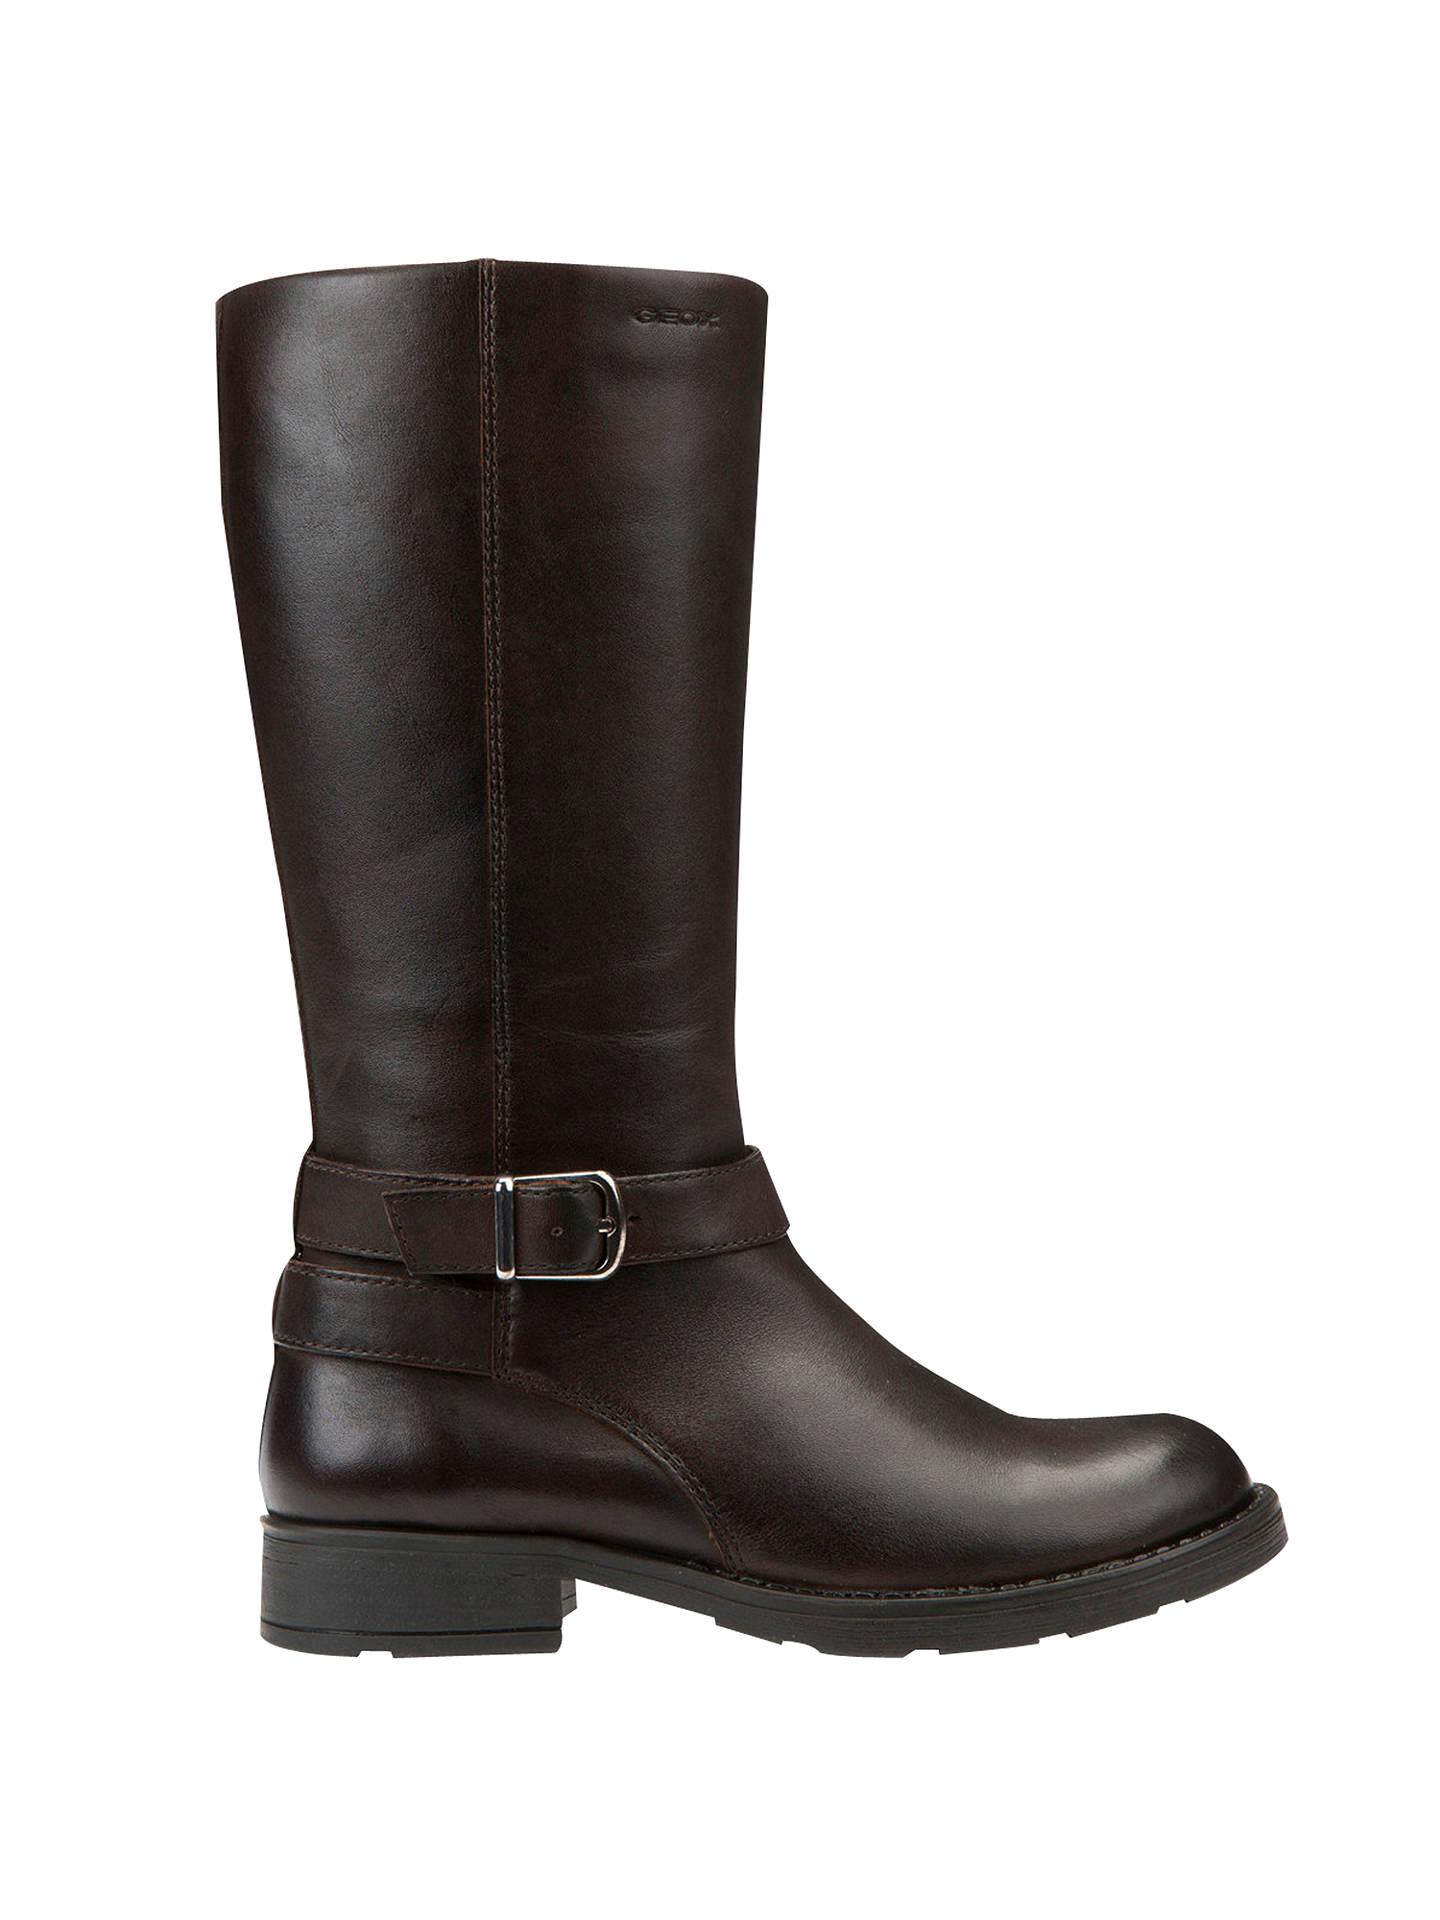 6b79c8b7 Geox Children's Jr Sofia Leather Boots, Coffee at John Lewis & Partners